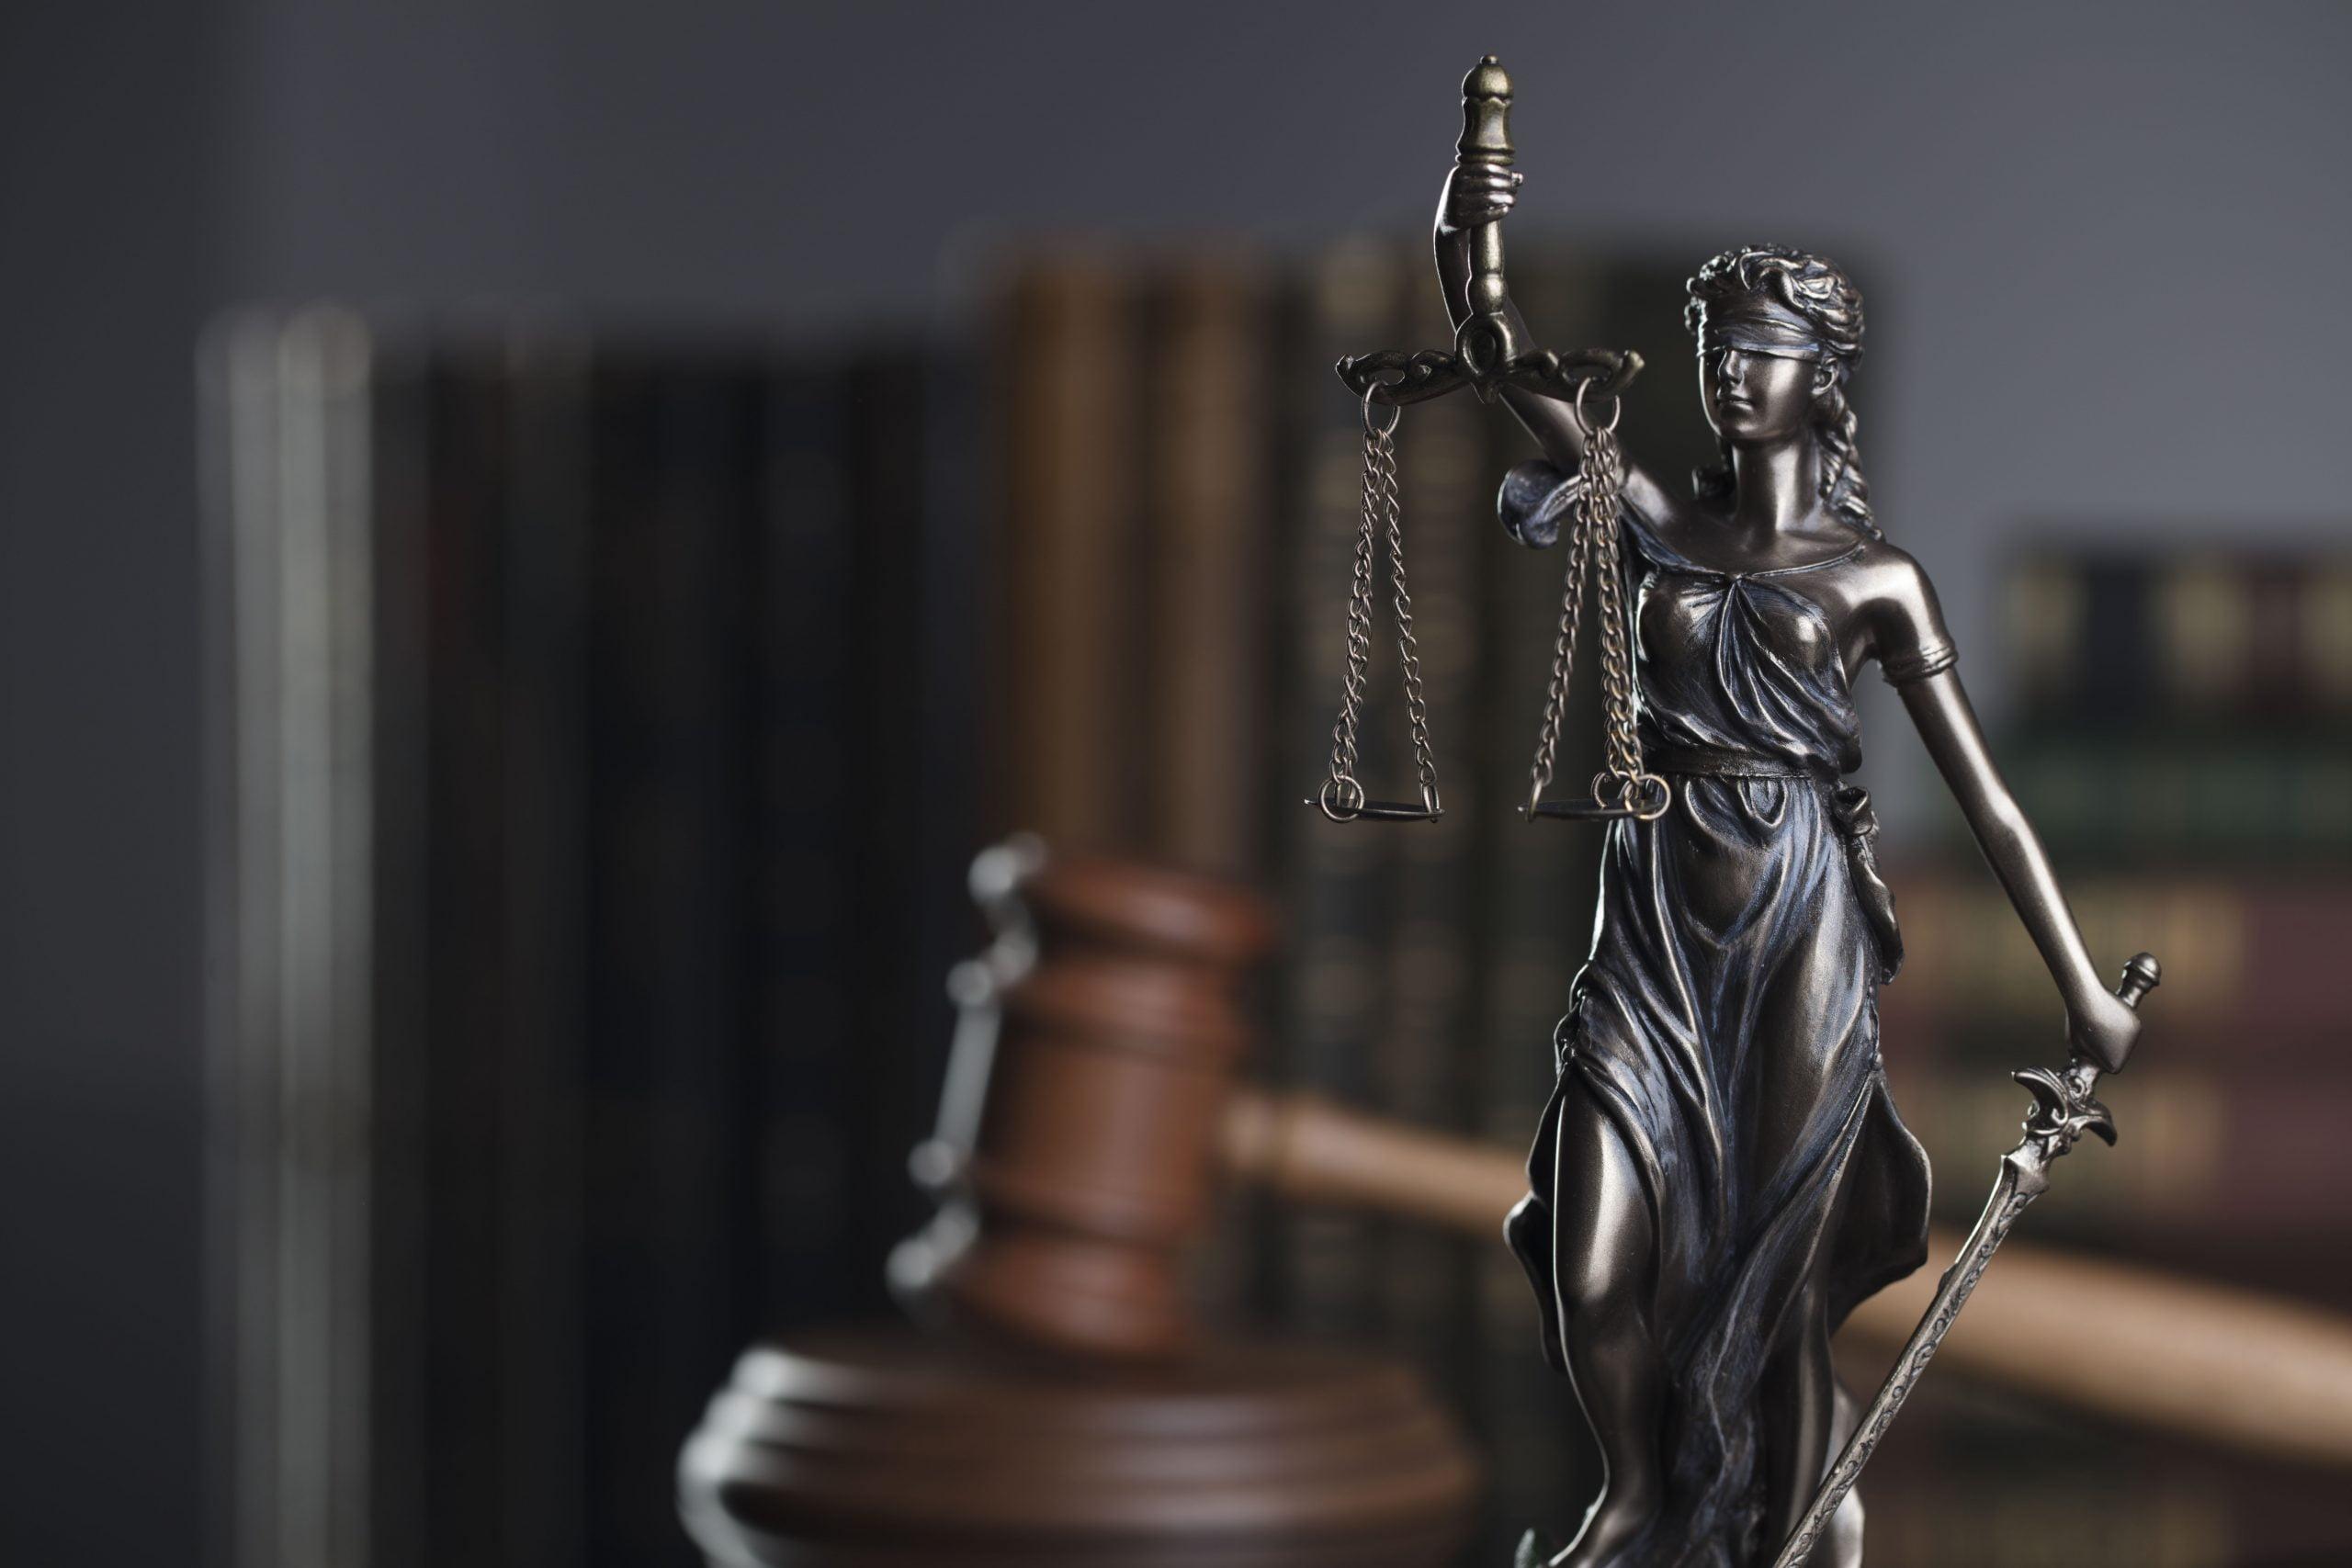 xrp crypto ripple sec lawsuit